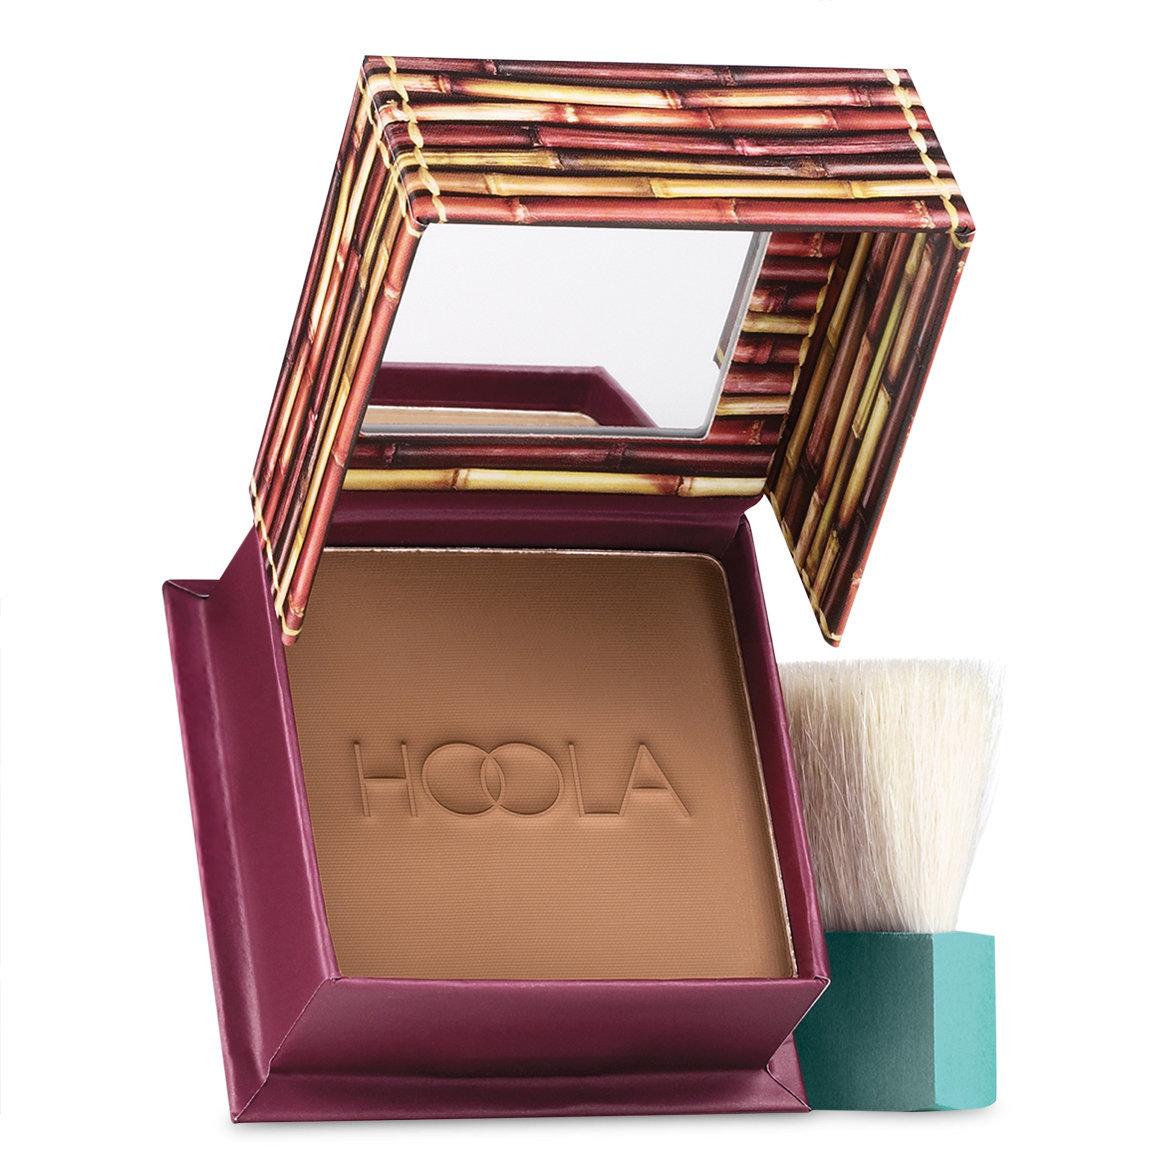 Benefit Cosmetics Hoola Matte Bronzer Original - Medium alternative view 1 - product swatch.